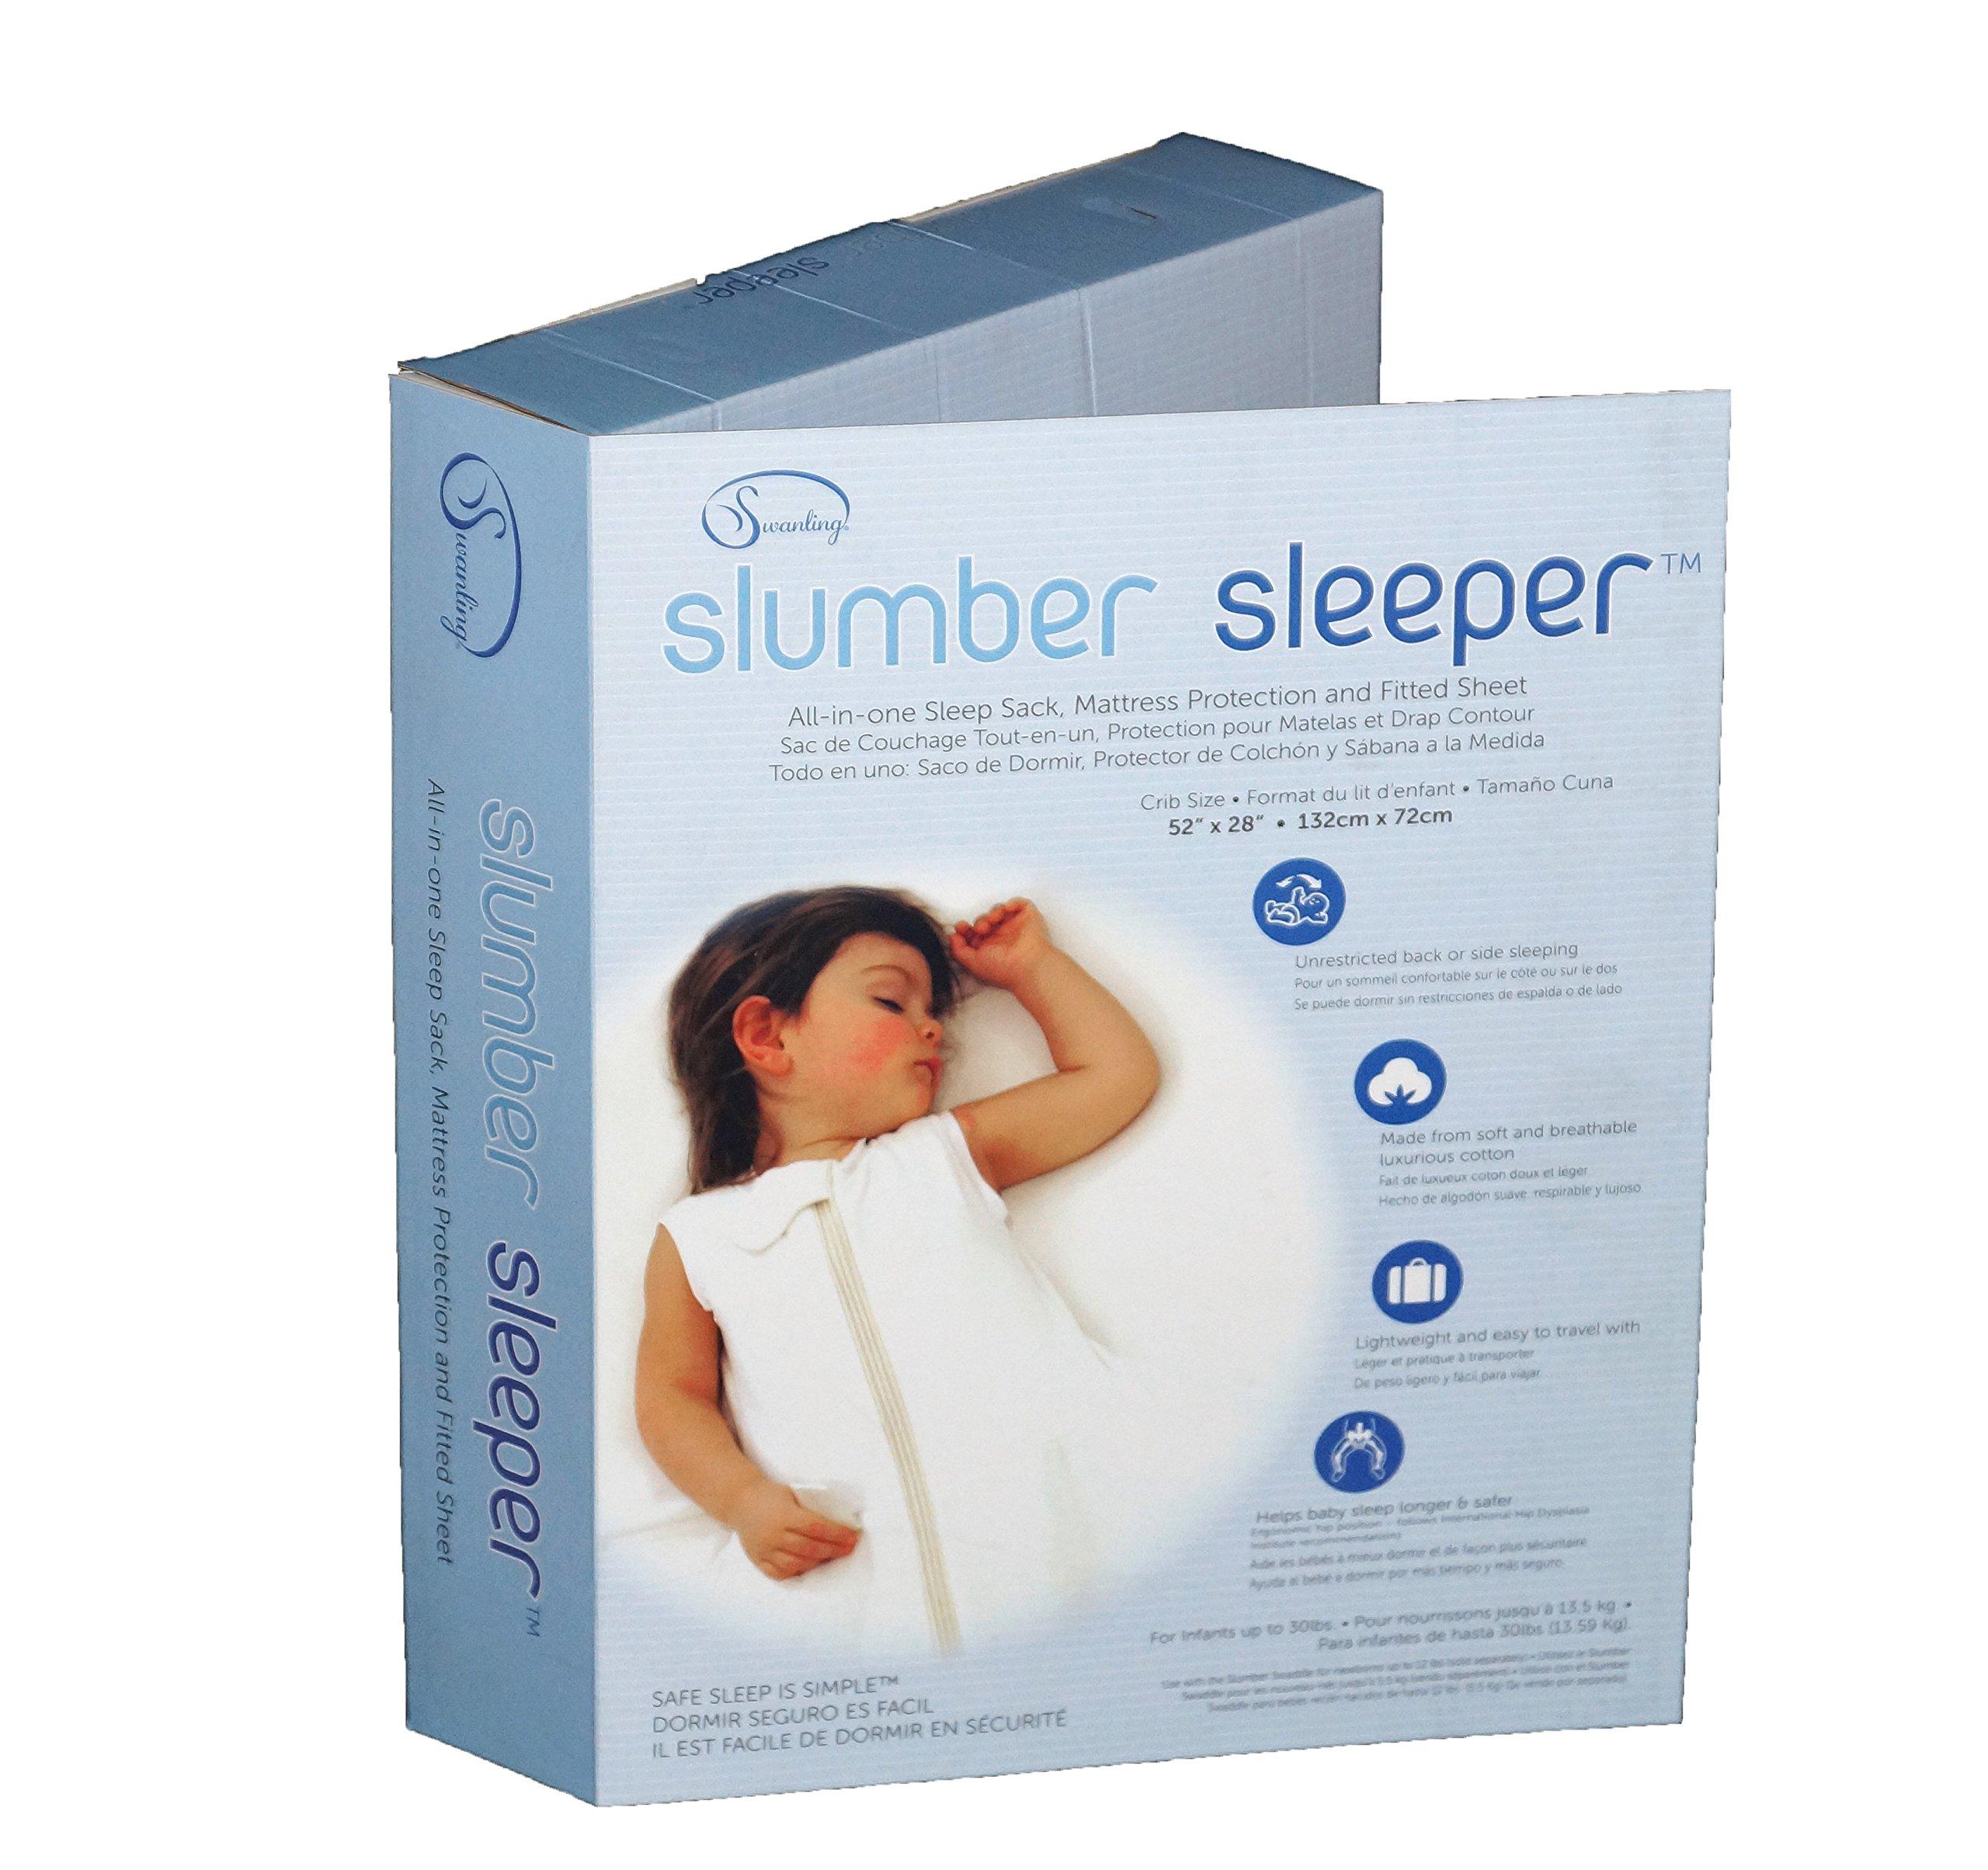 Slumber Sleeper Crib Size in Cotton/Spandex